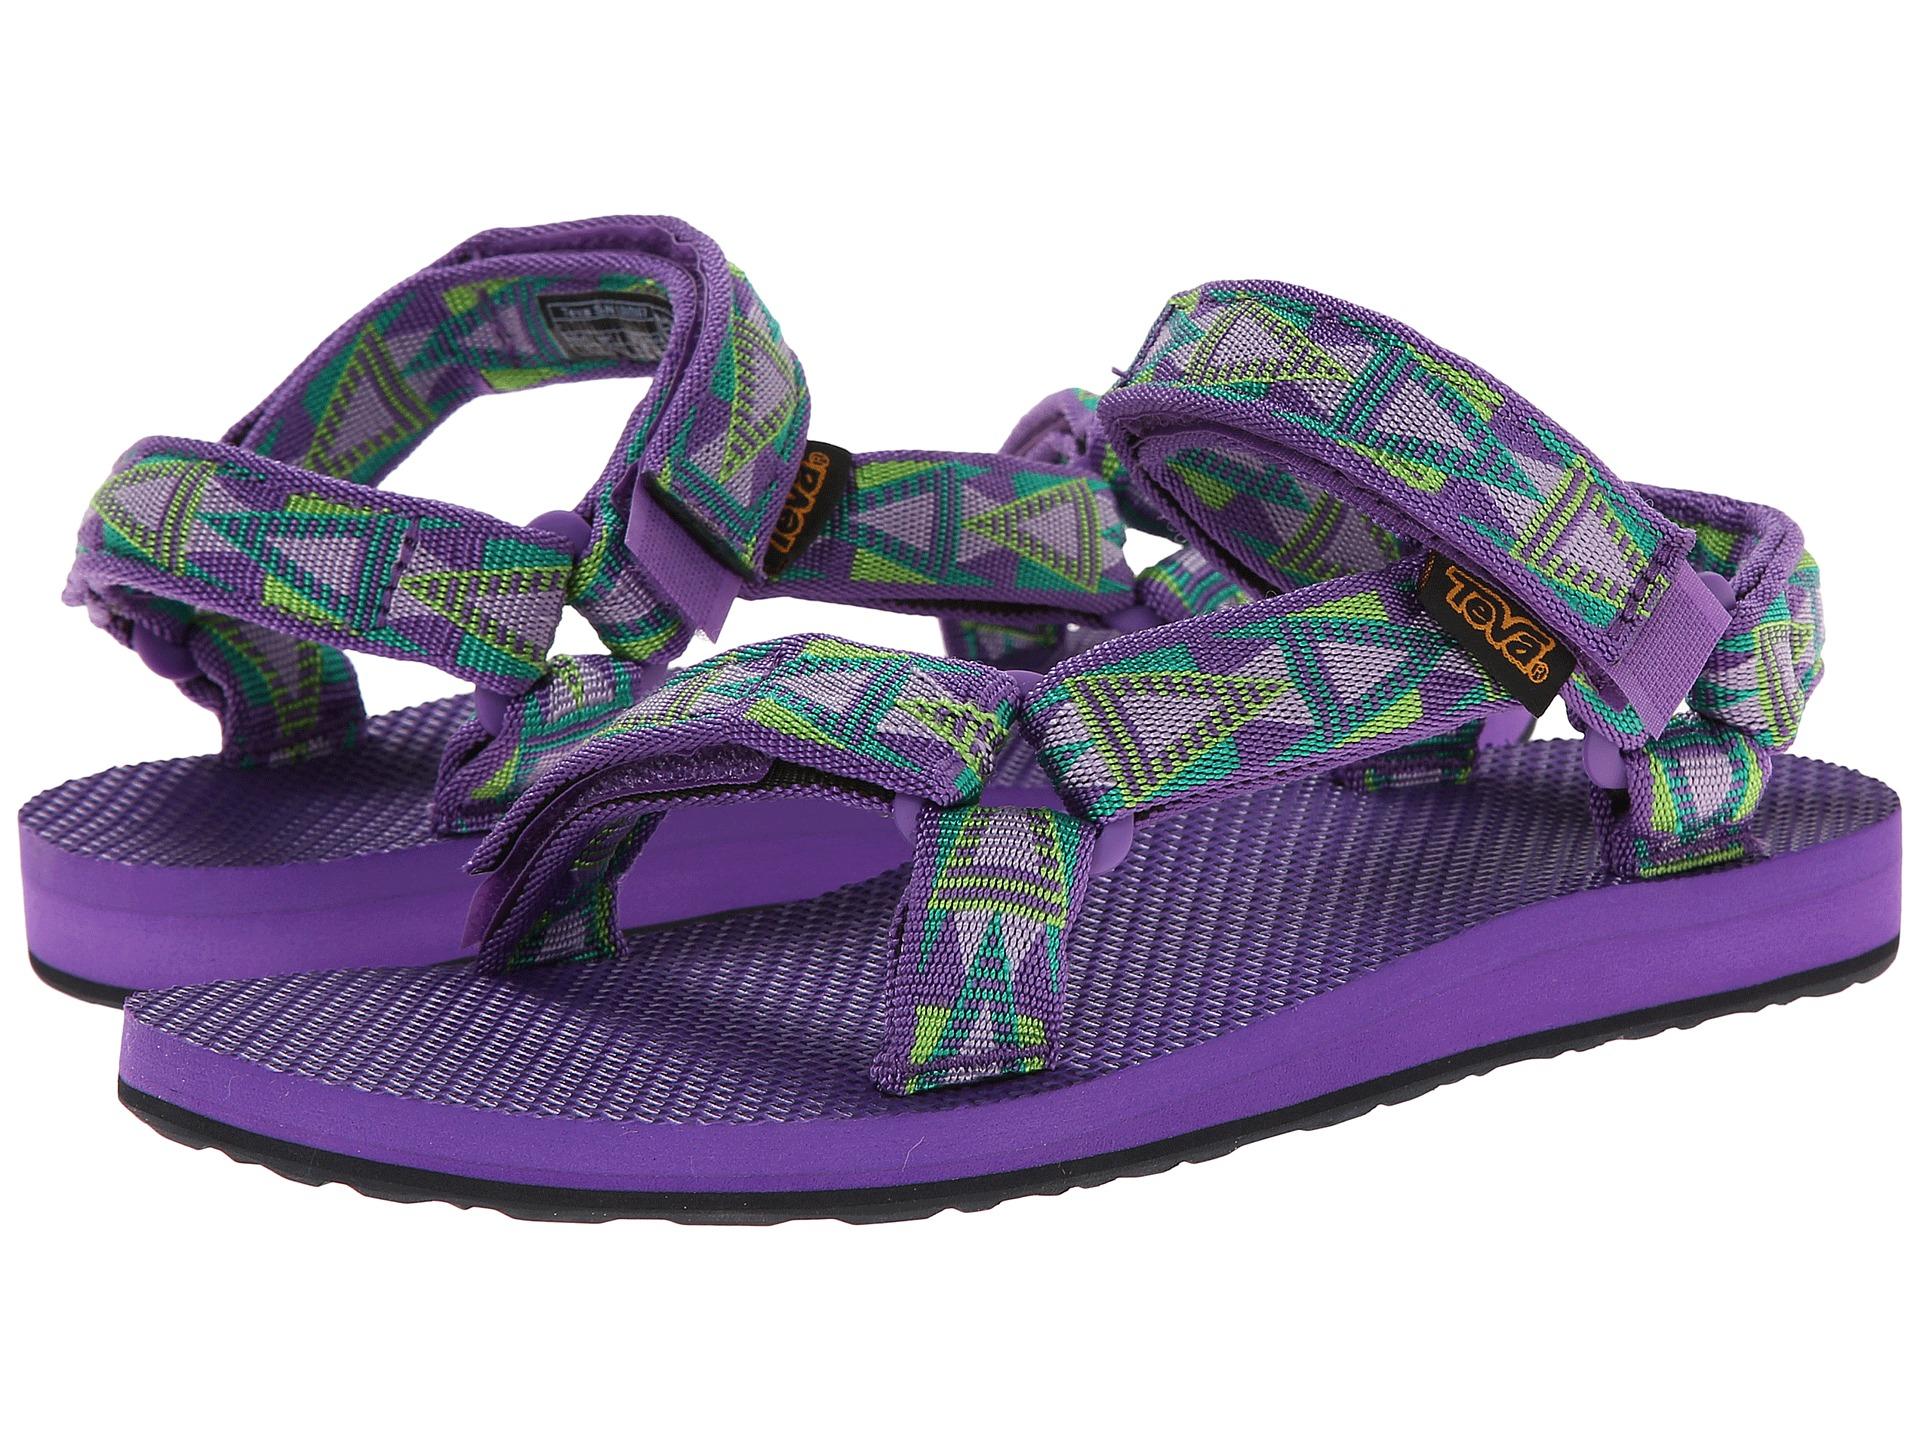 Teva Synthetic Original Universal Sea Fog Flat Sandals In